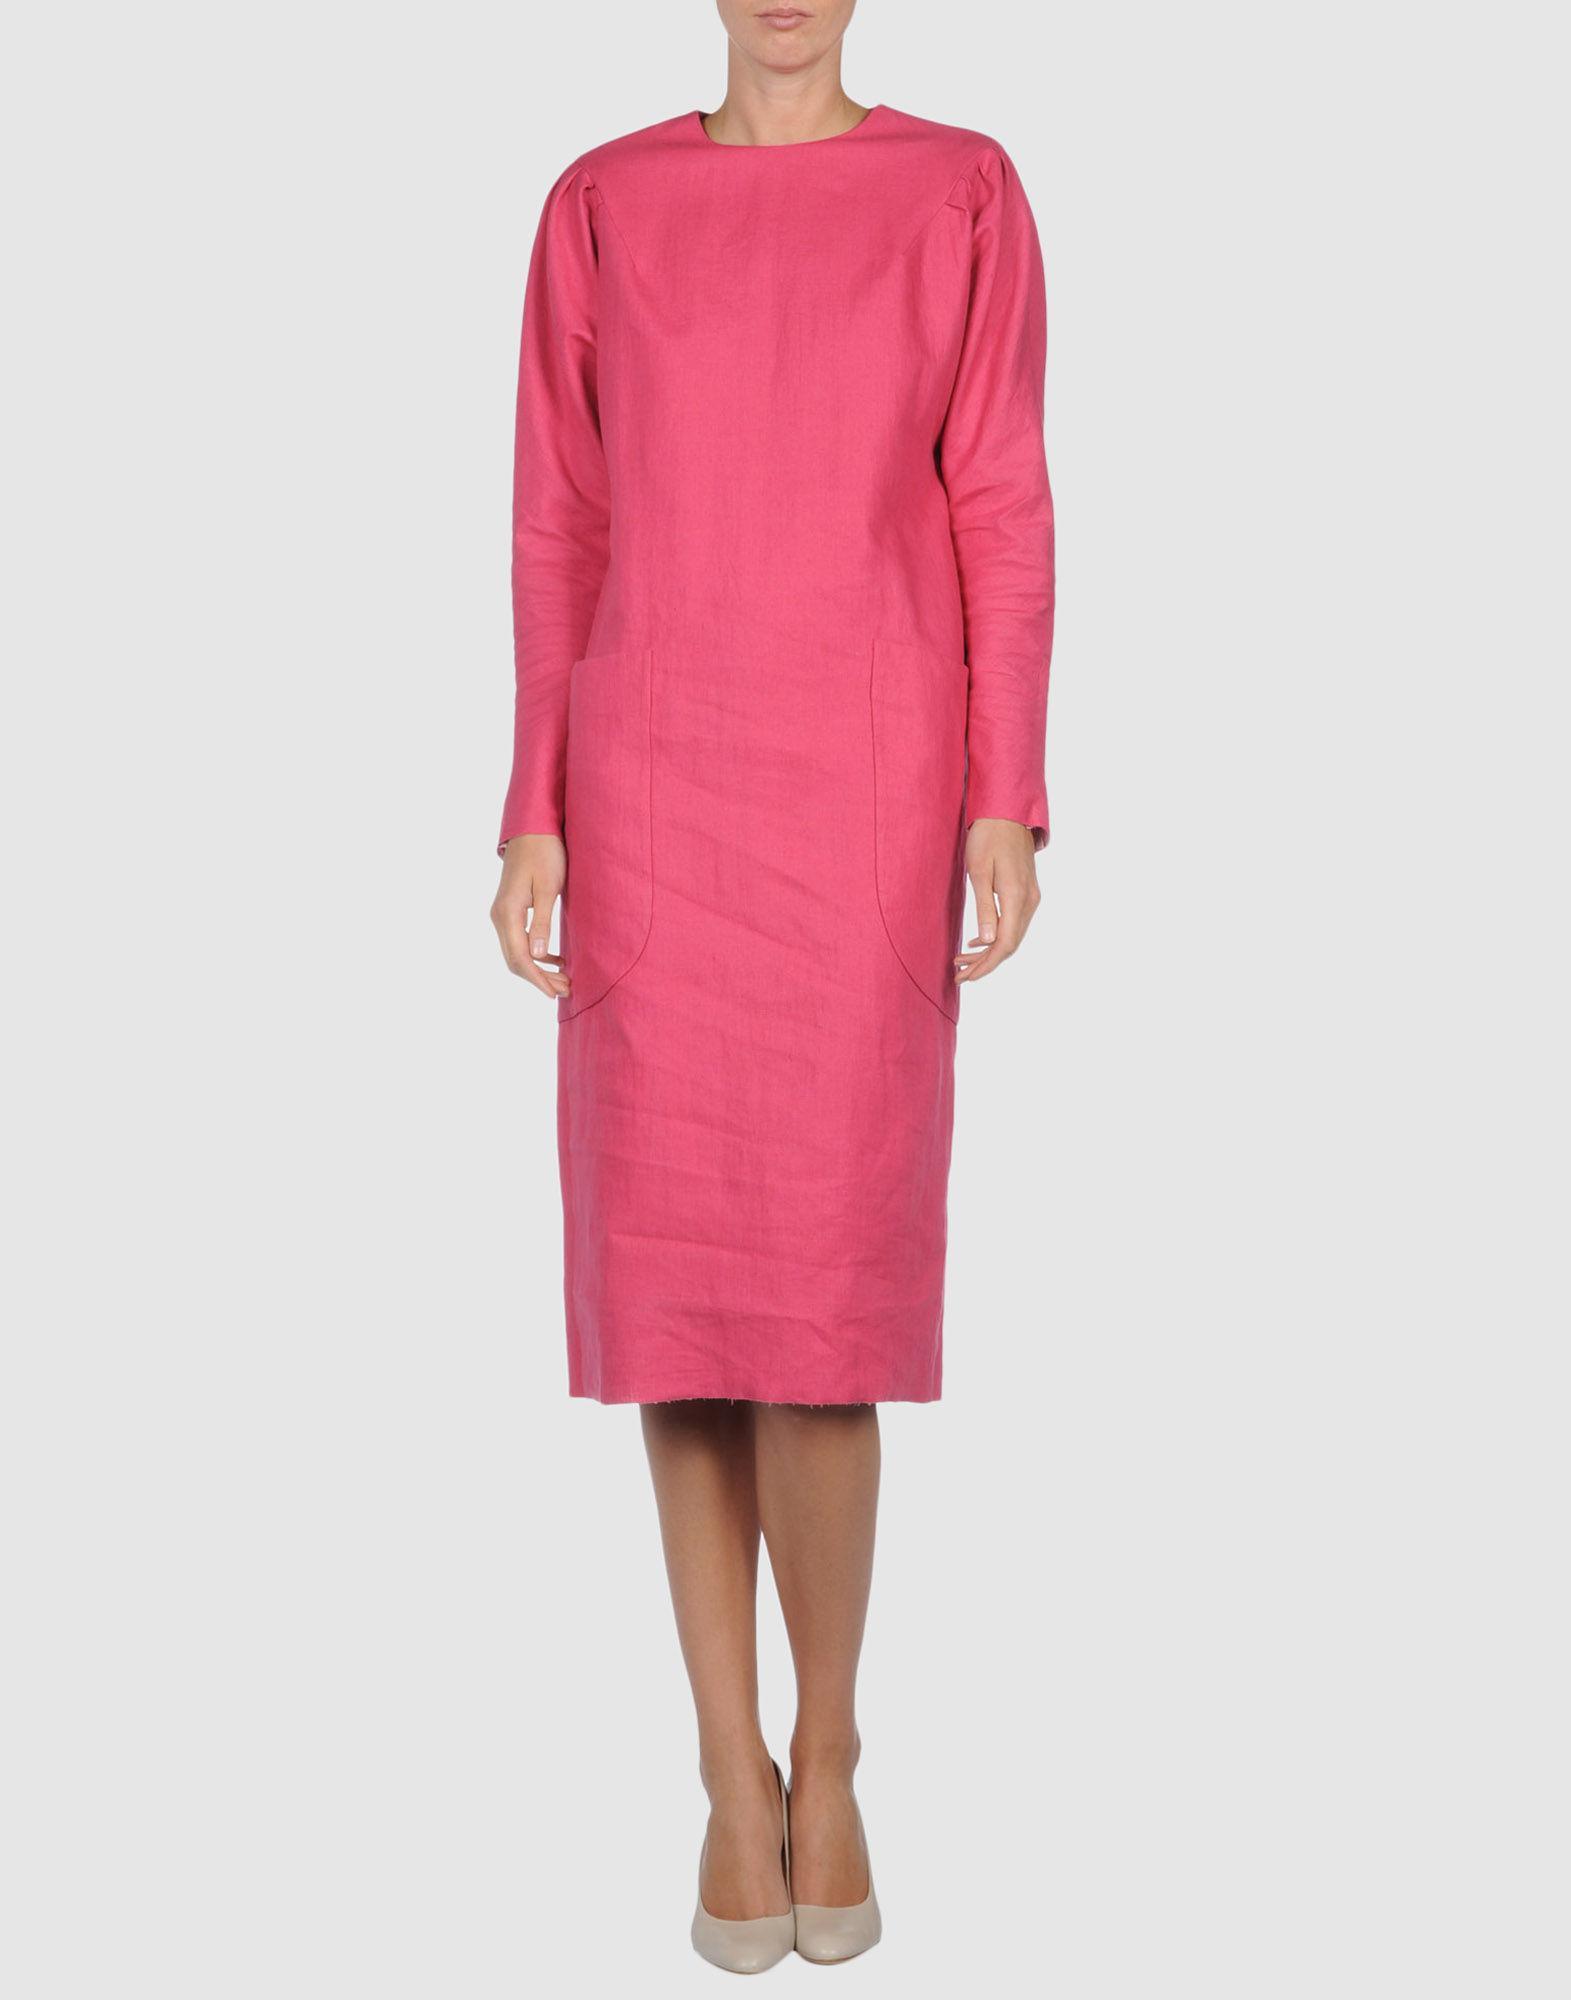 34225455MX 14 f - Βραδυνα Φορεματα Yves Saint Laurent Rive Gauche Κωδ.15